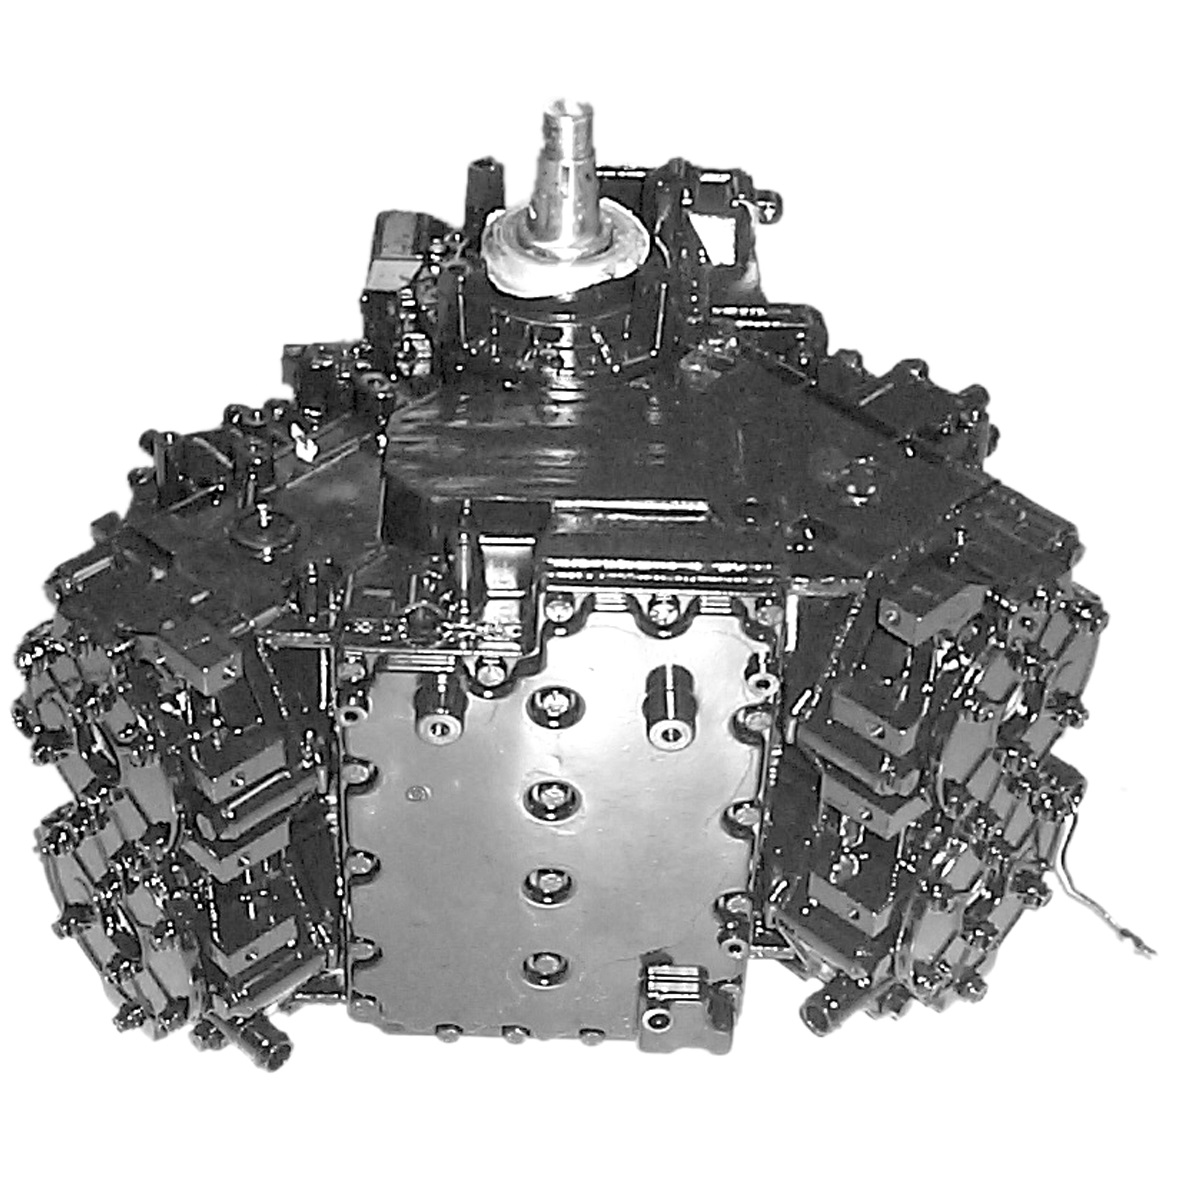 je-v4-crossflow-flatback-complete-powerhead-1978-1998.jpg